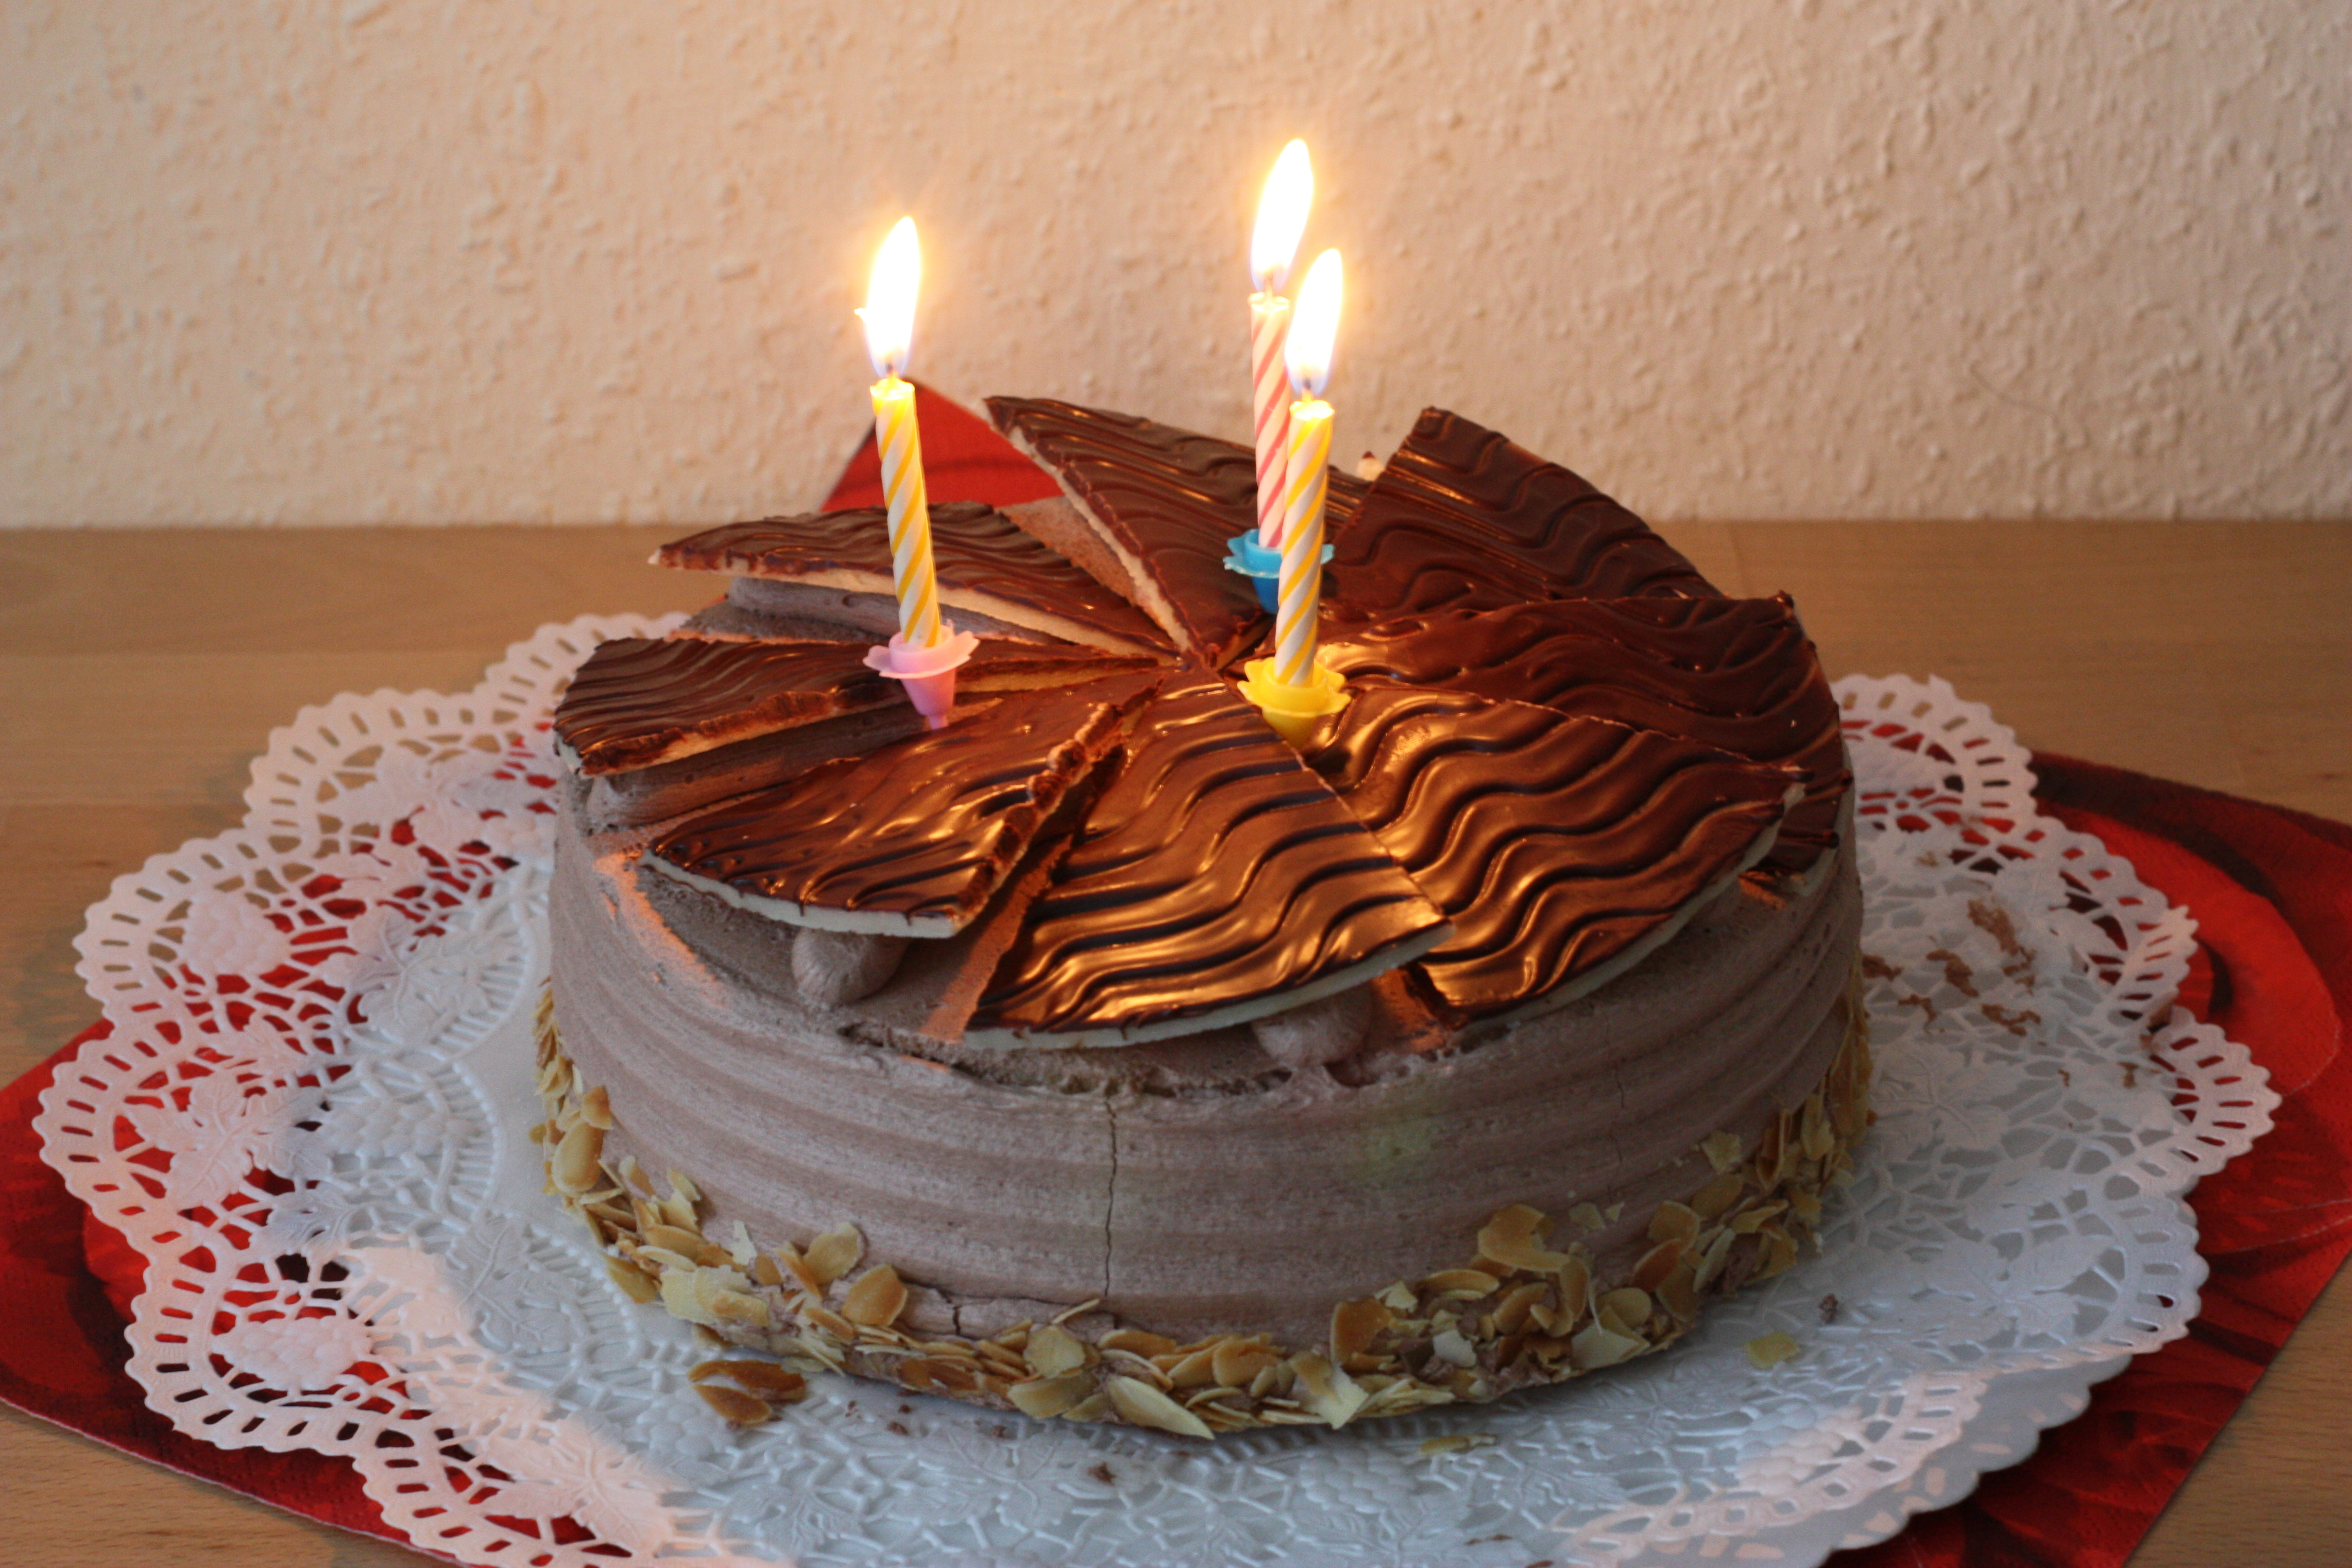 File Schokoladentorte Buttercreme Tulpen Dritter Geburtstag 001 Jpg